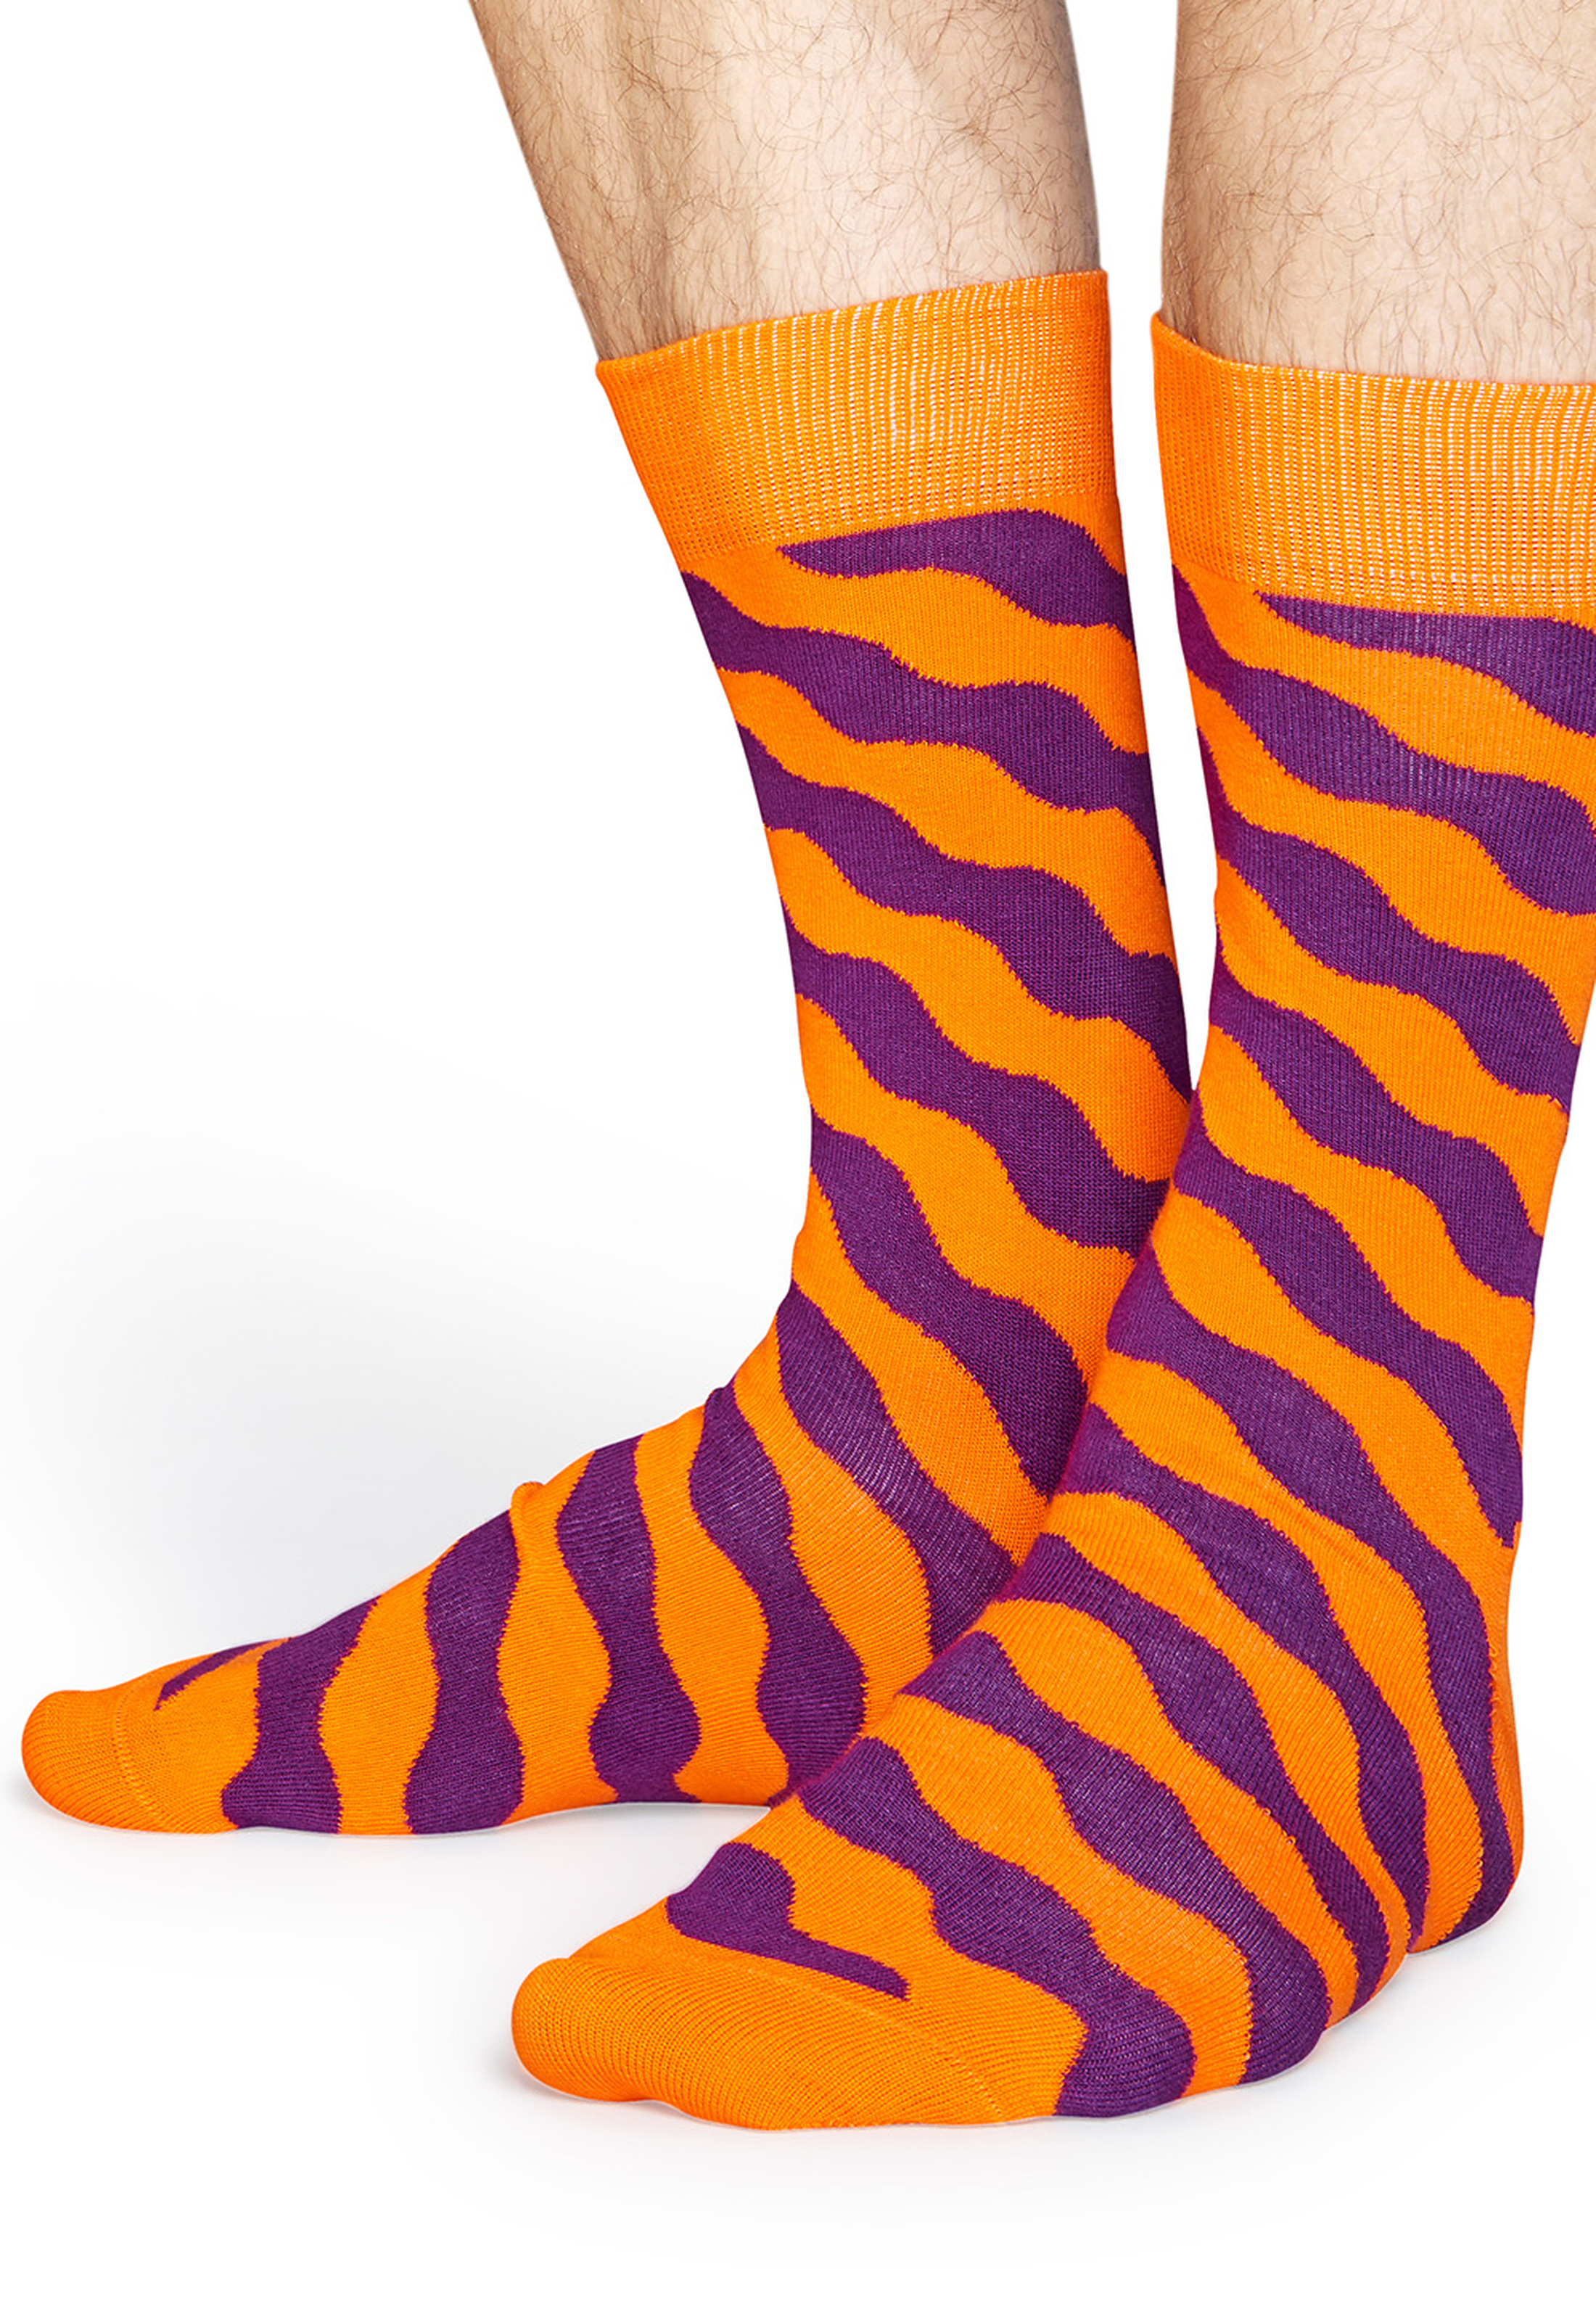 Happy Socks Wavy Polka WPO01-2000 foto 1